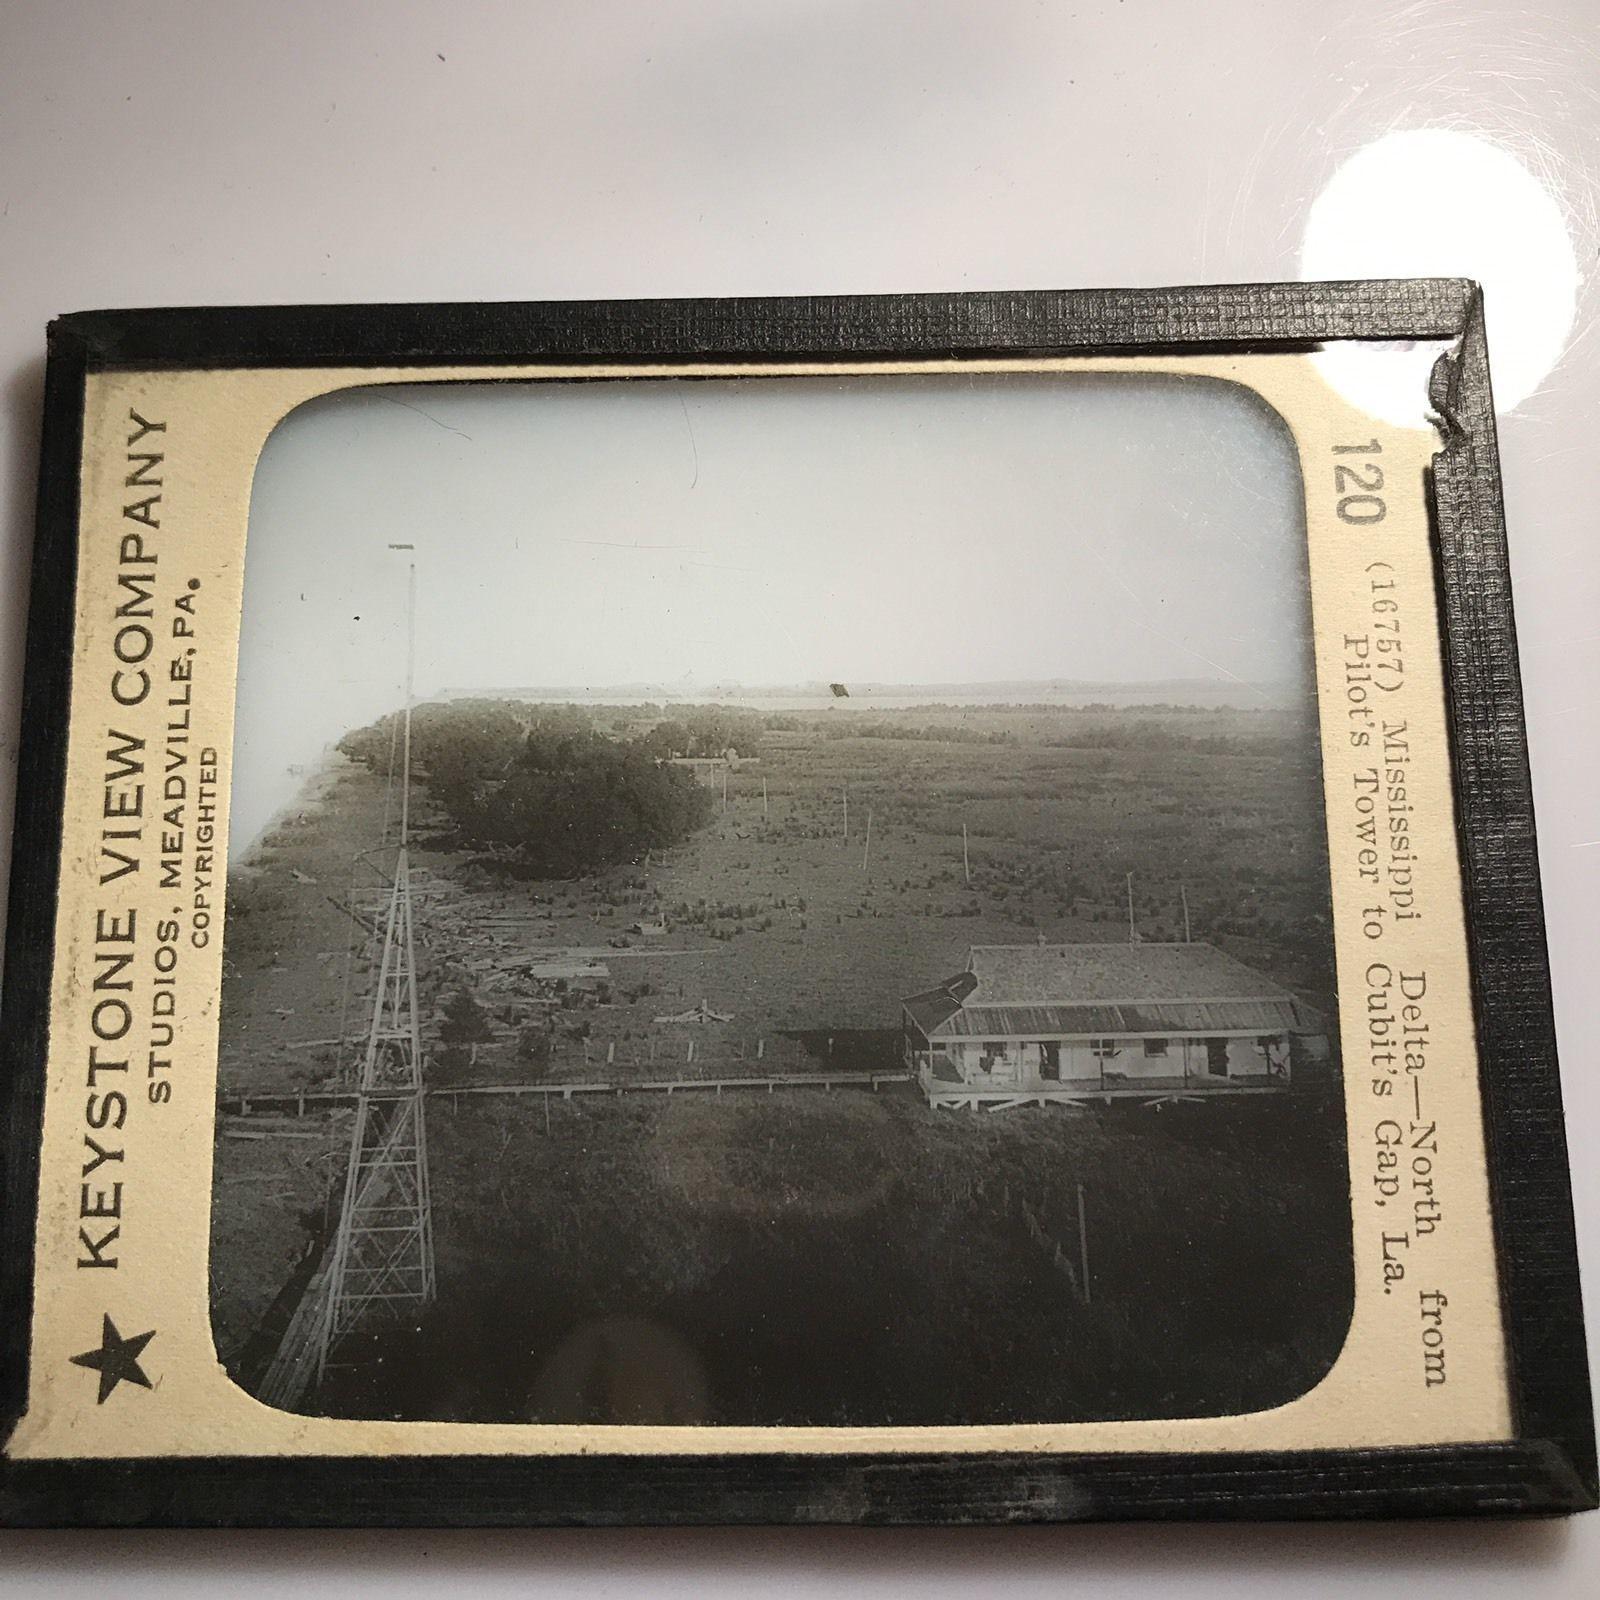 Vtg Keystone Magic Lantern Slide Photo Cubit's Gap Mississippi Delta